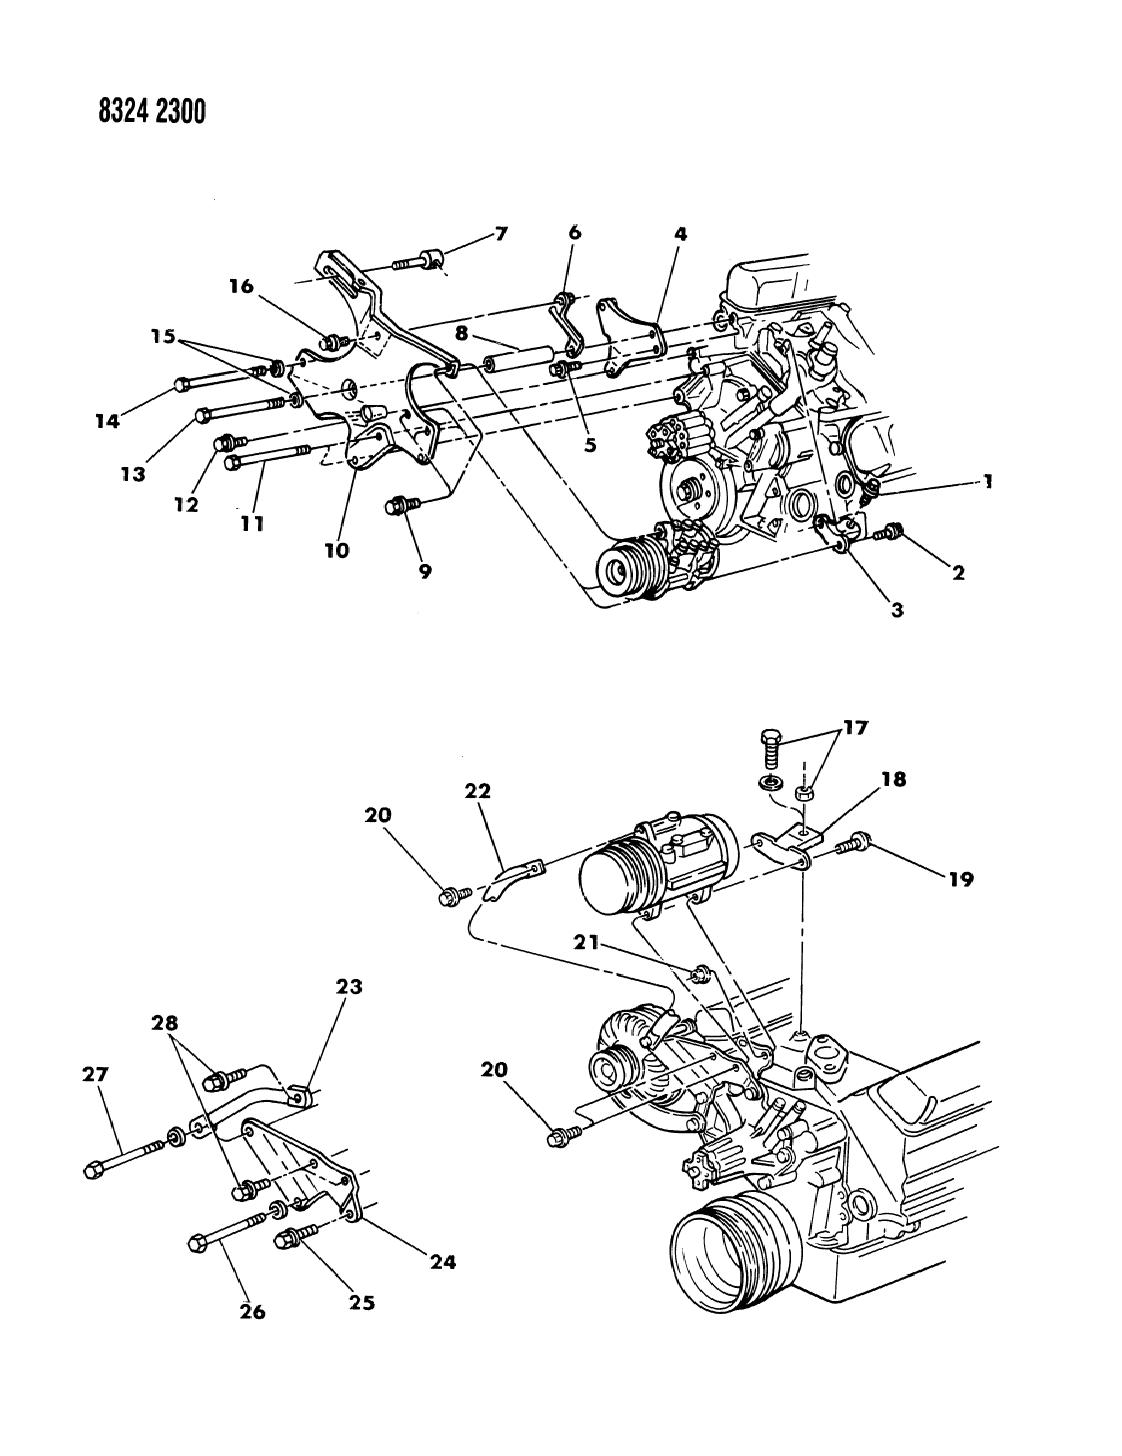 1988 Dodge Ram Van Mounting - A/C Compressor - Mopar Parts Giant